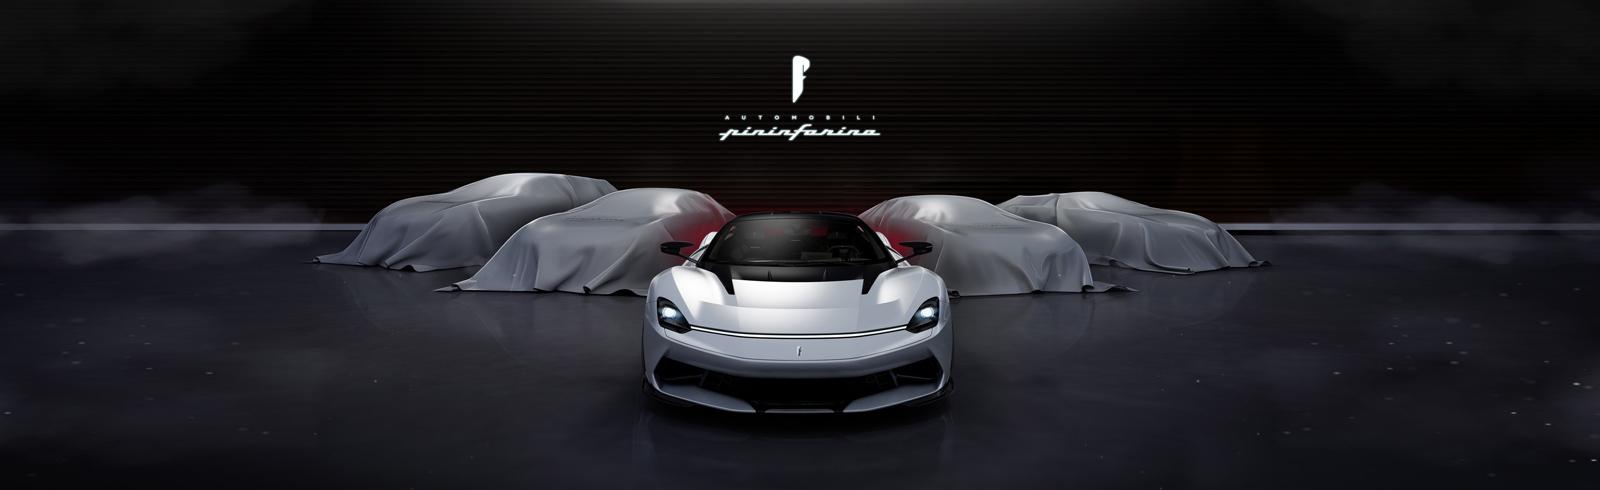 Pininfarina Battista will enter production in a year, PURA Vision teased